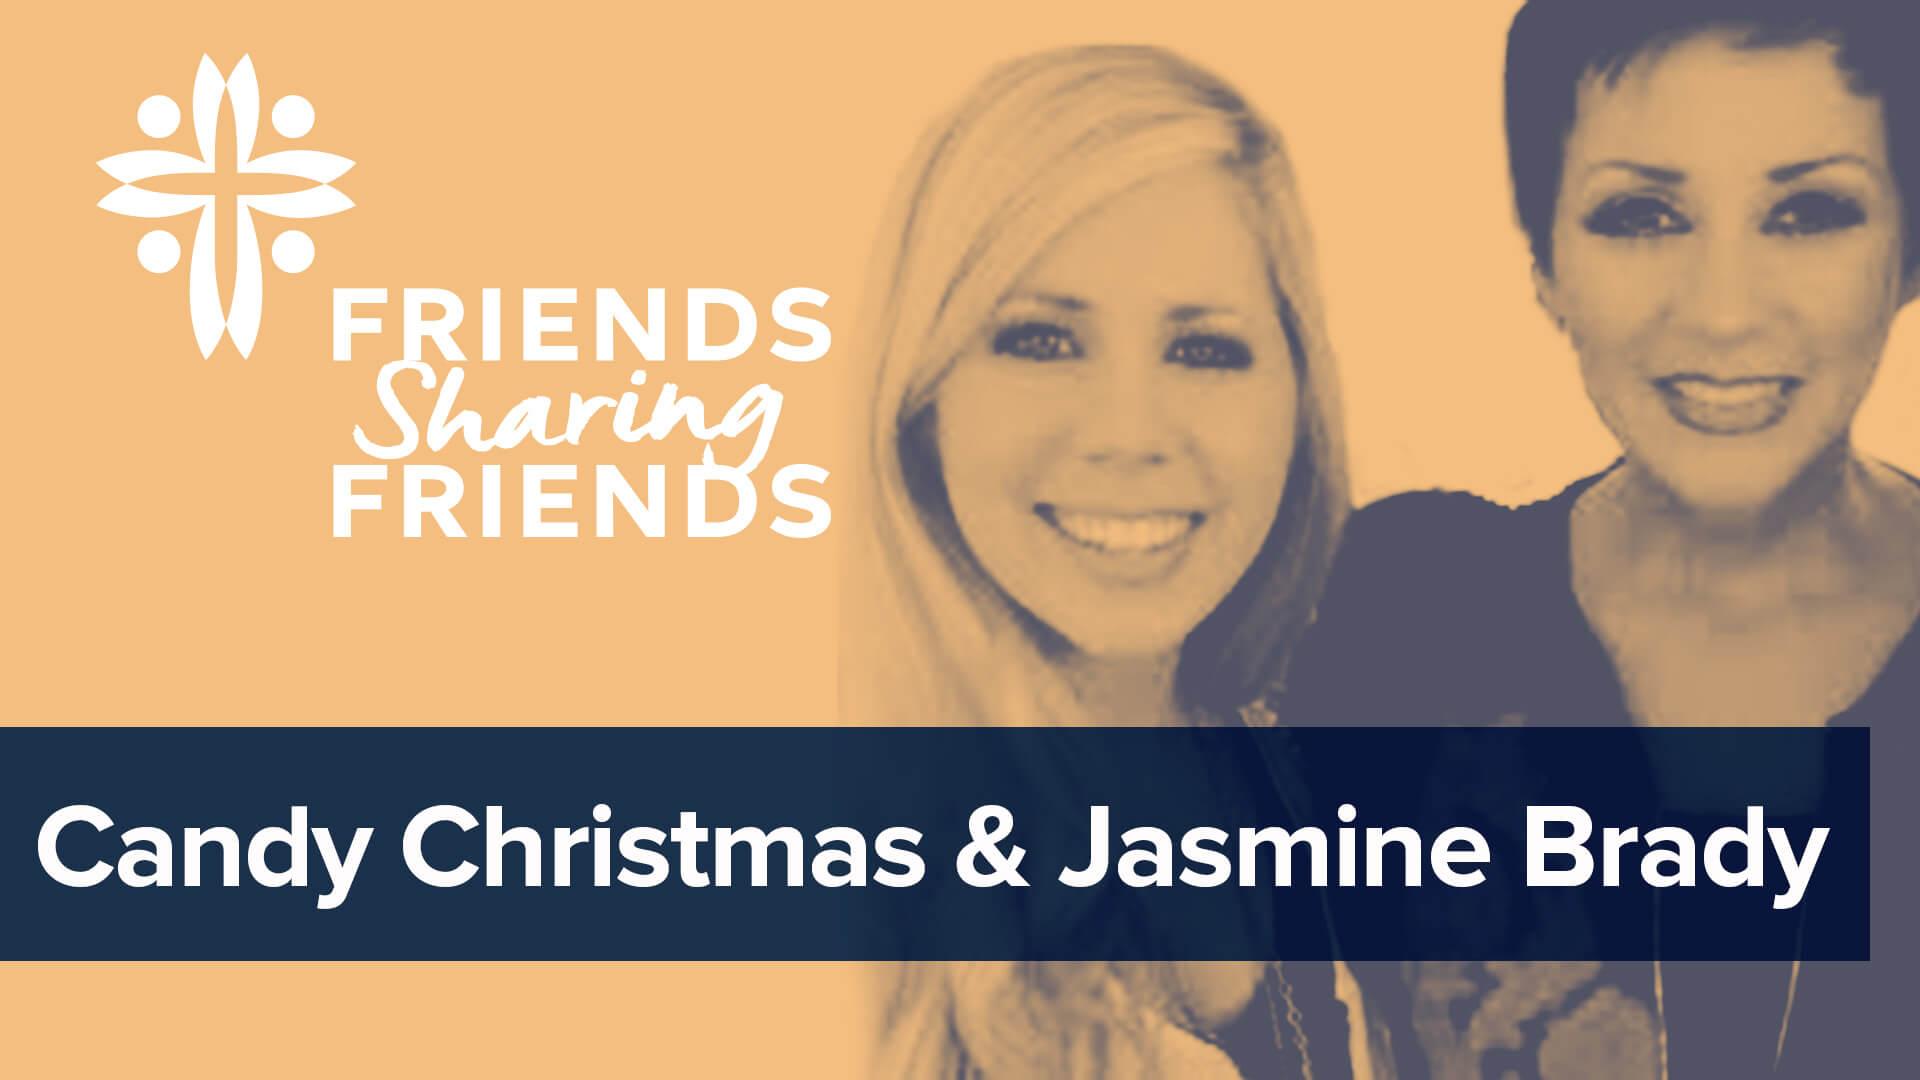 Candy Christmas and Jasmine Brady.